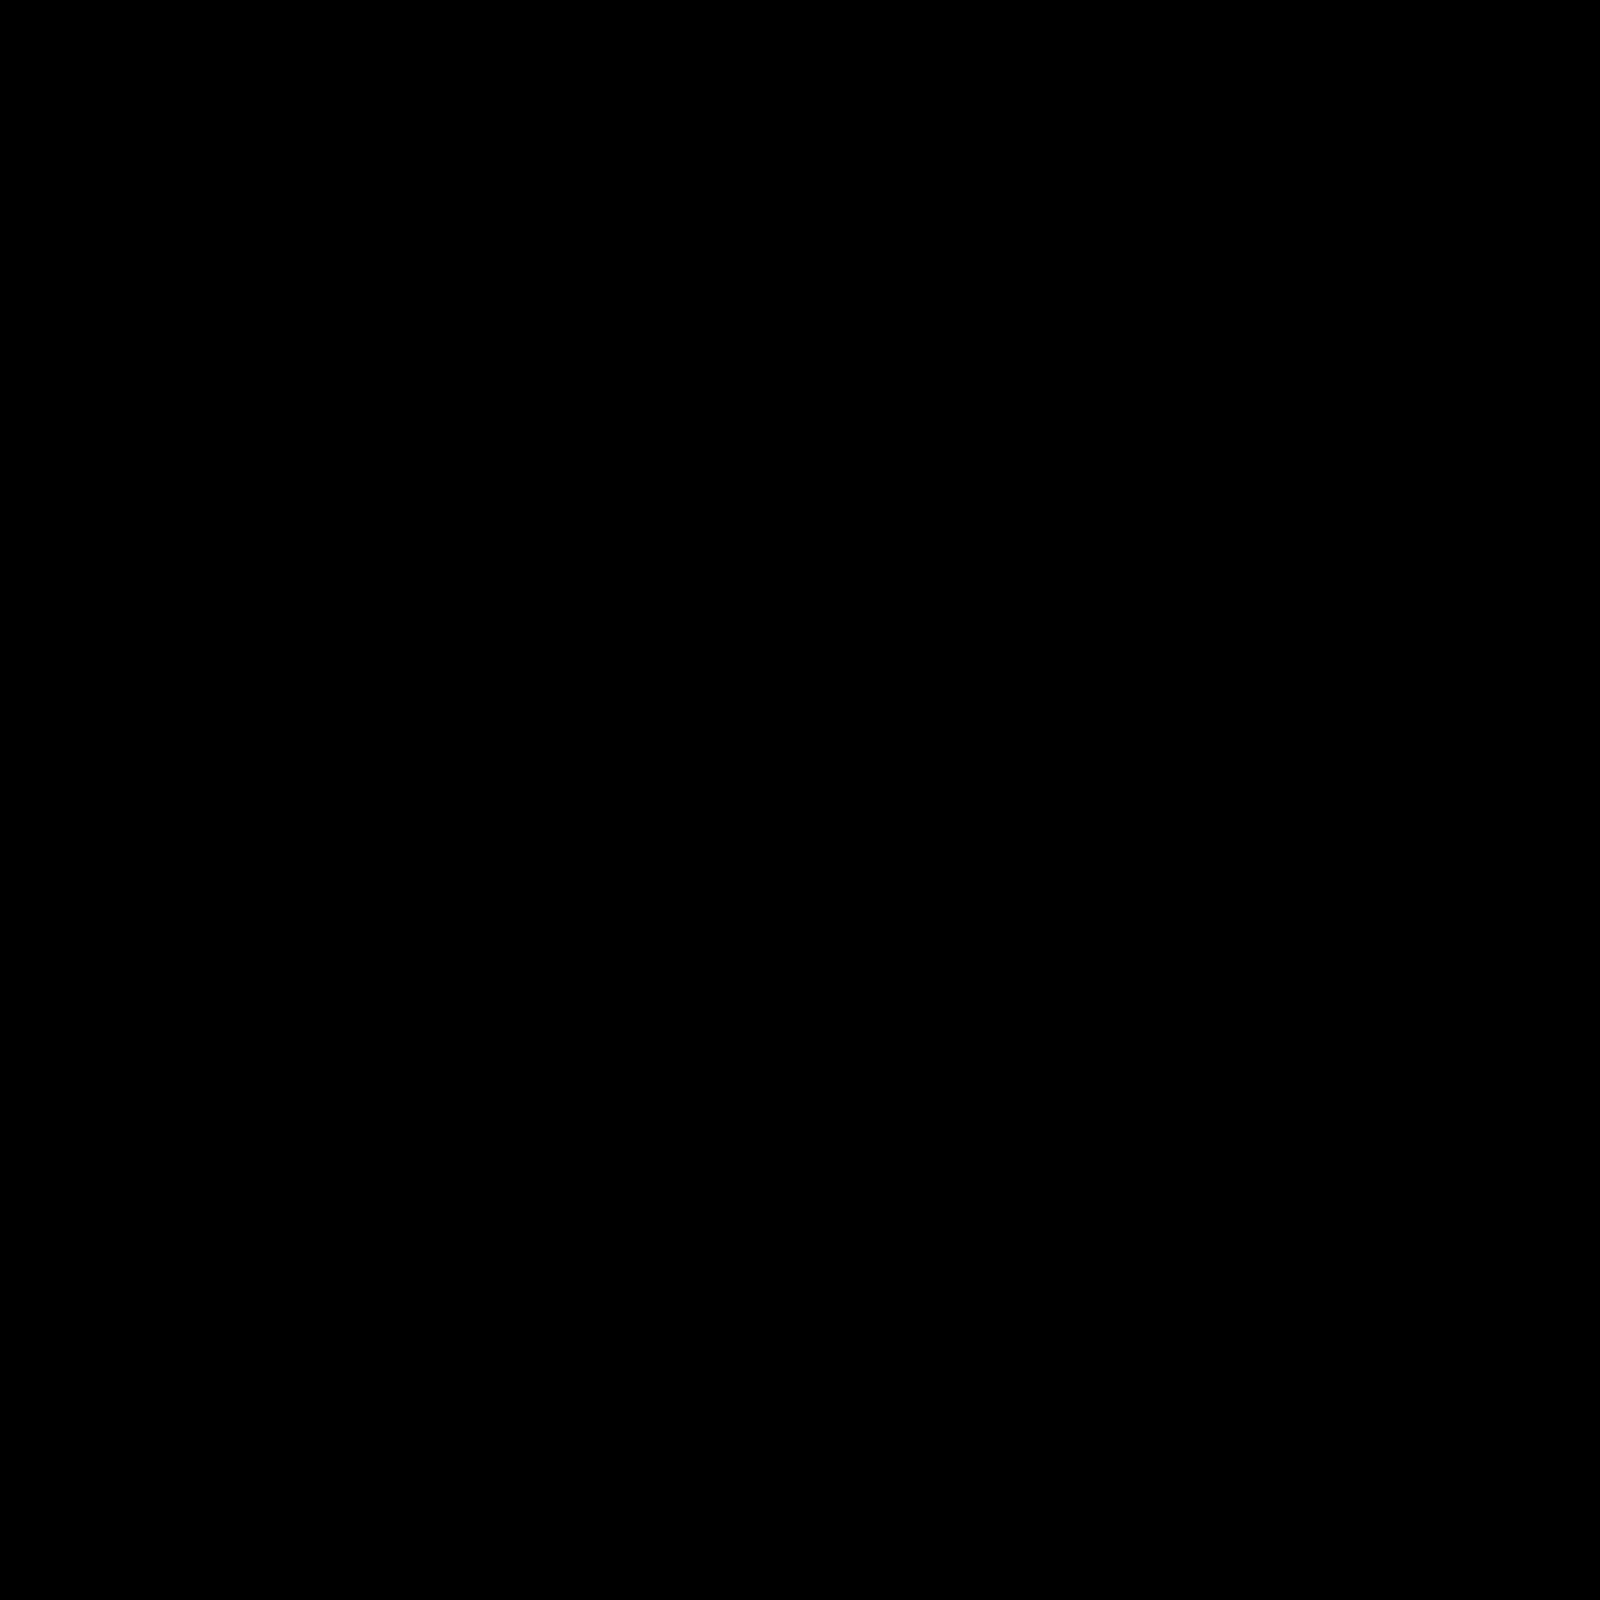 סימן כוכב מארס